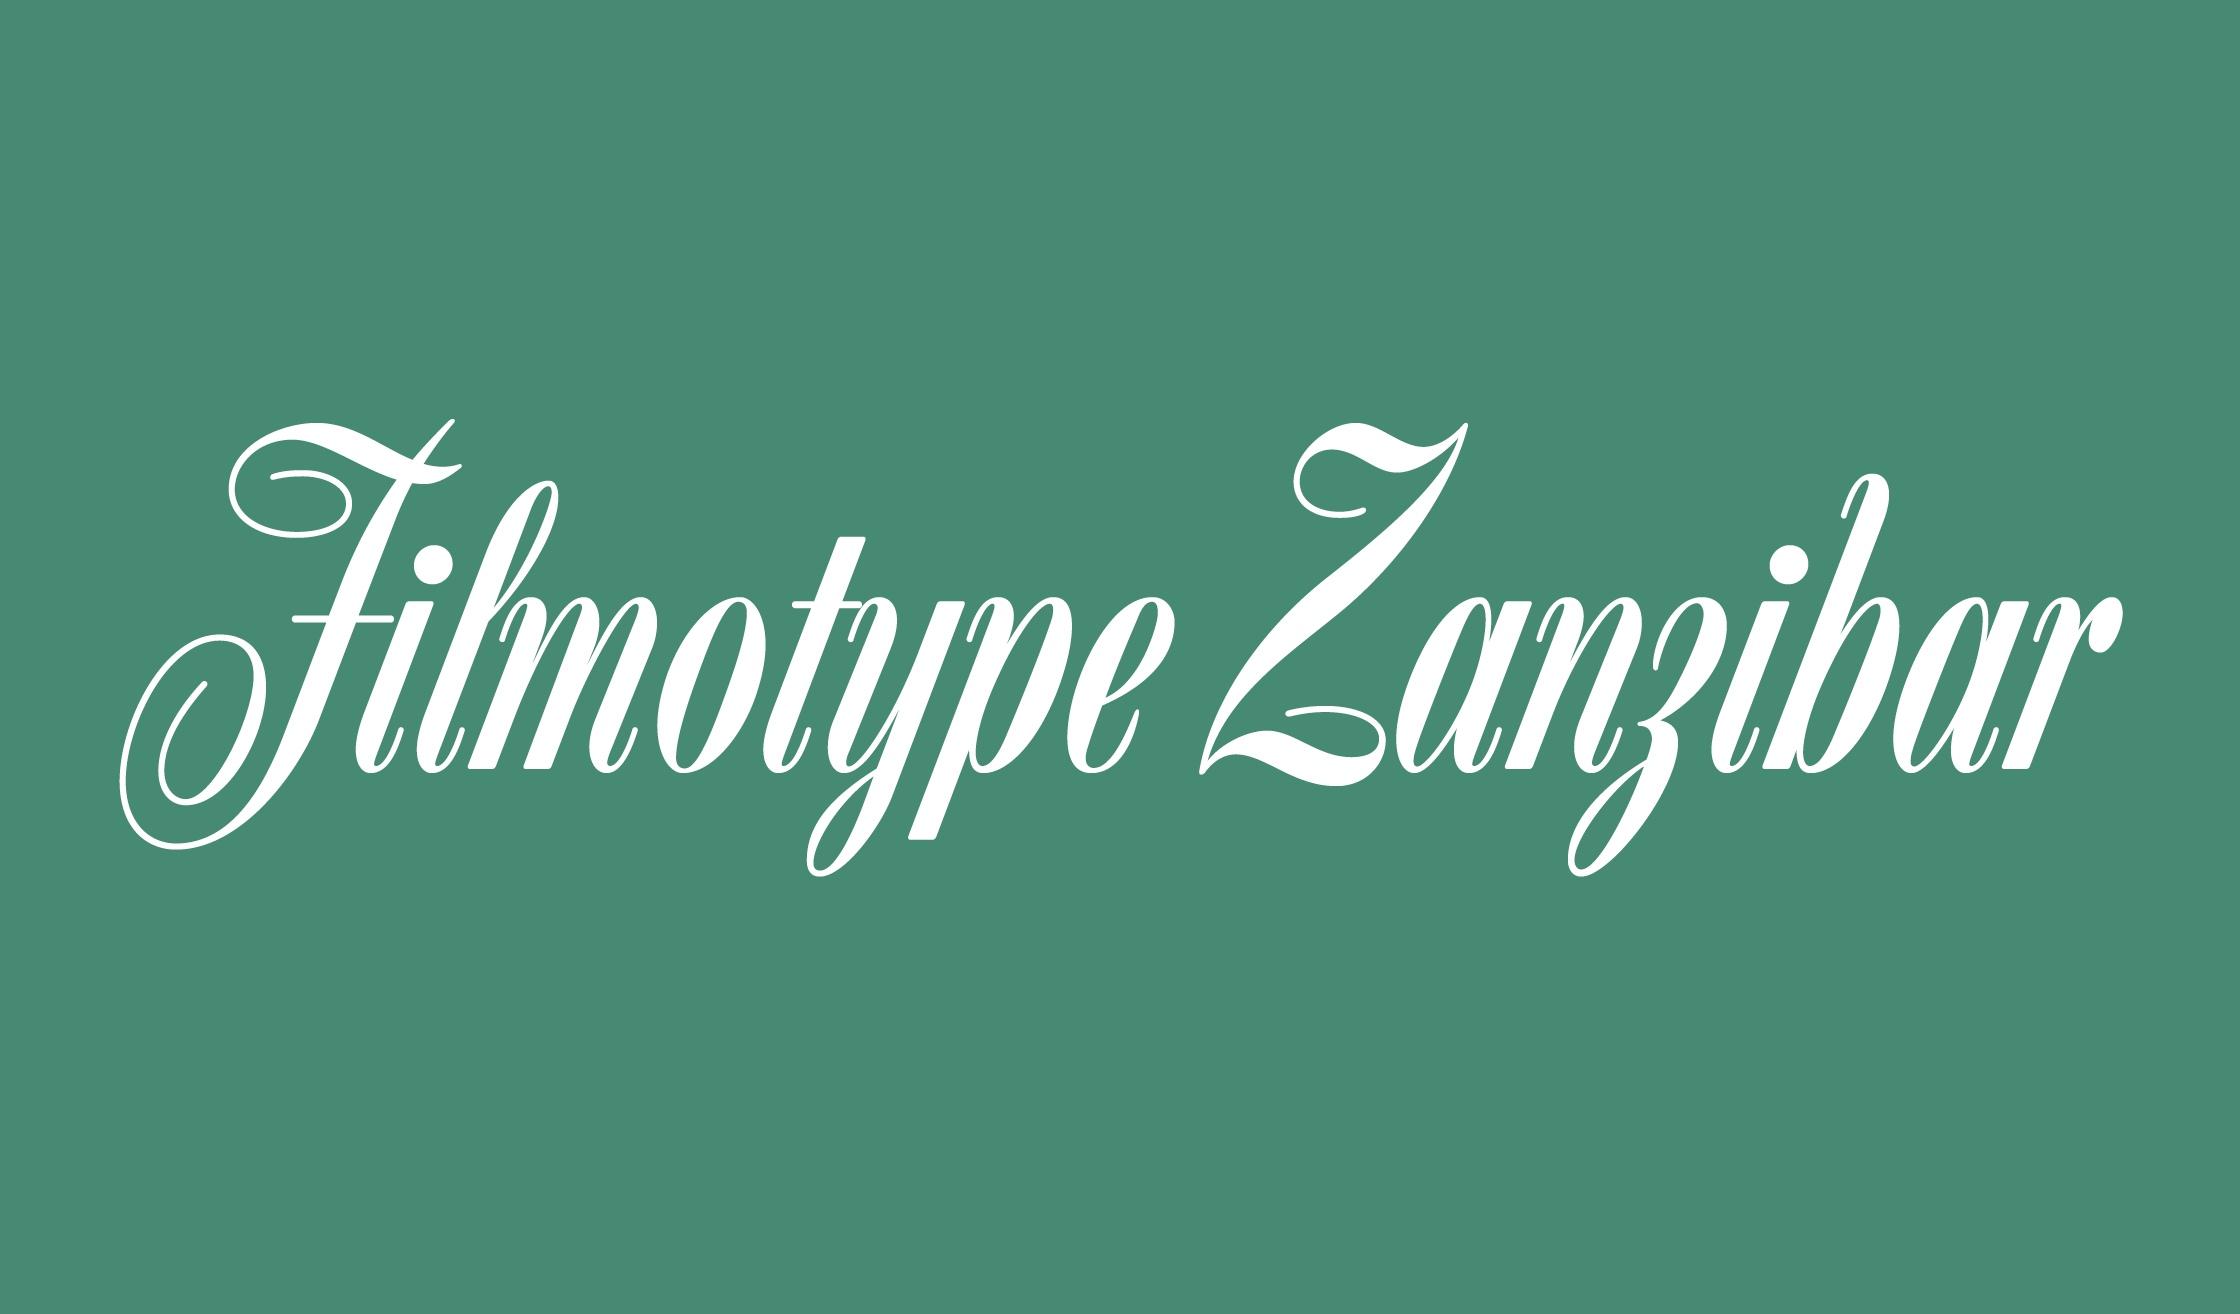 Filmotype Zanzibar花体唯美好看的英文字体下载